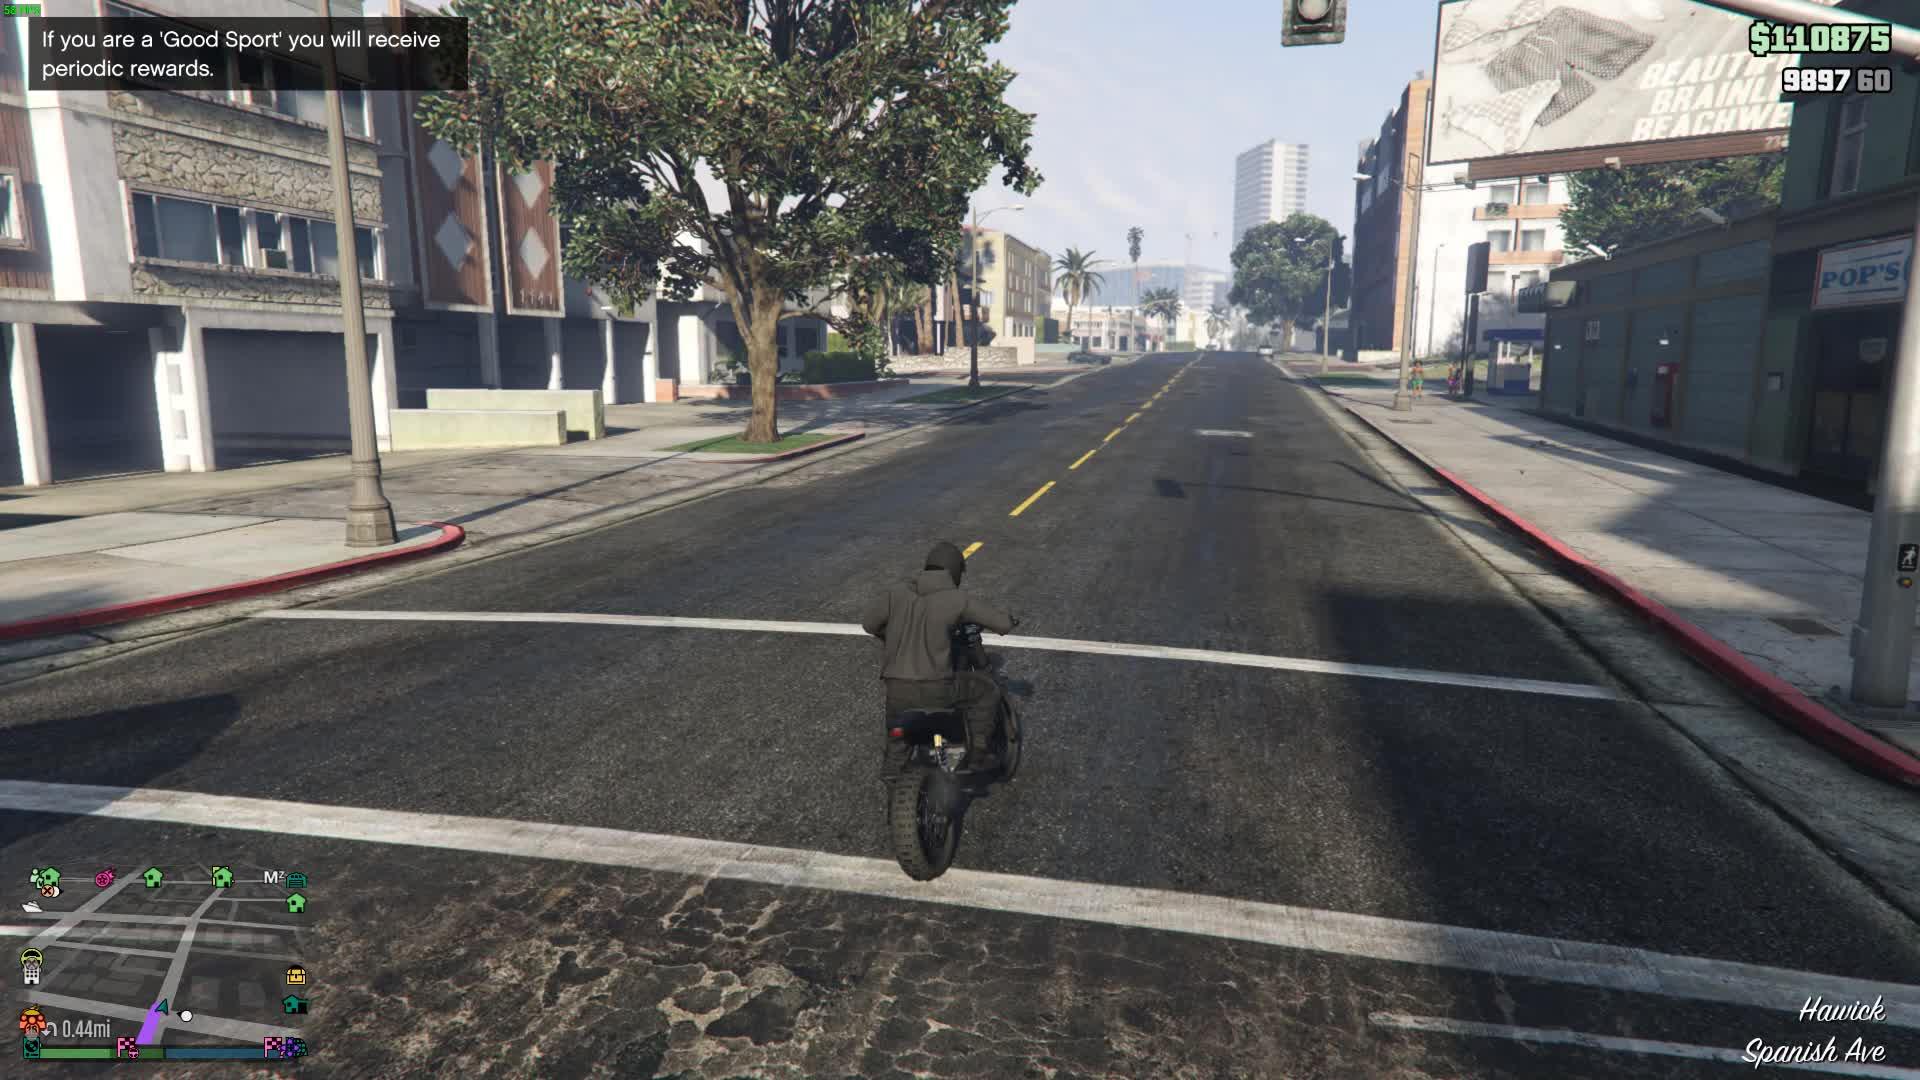 grandtheftautov, Grand Theft Auto V 2018.10.04 - 00.27.56.05 GIFs